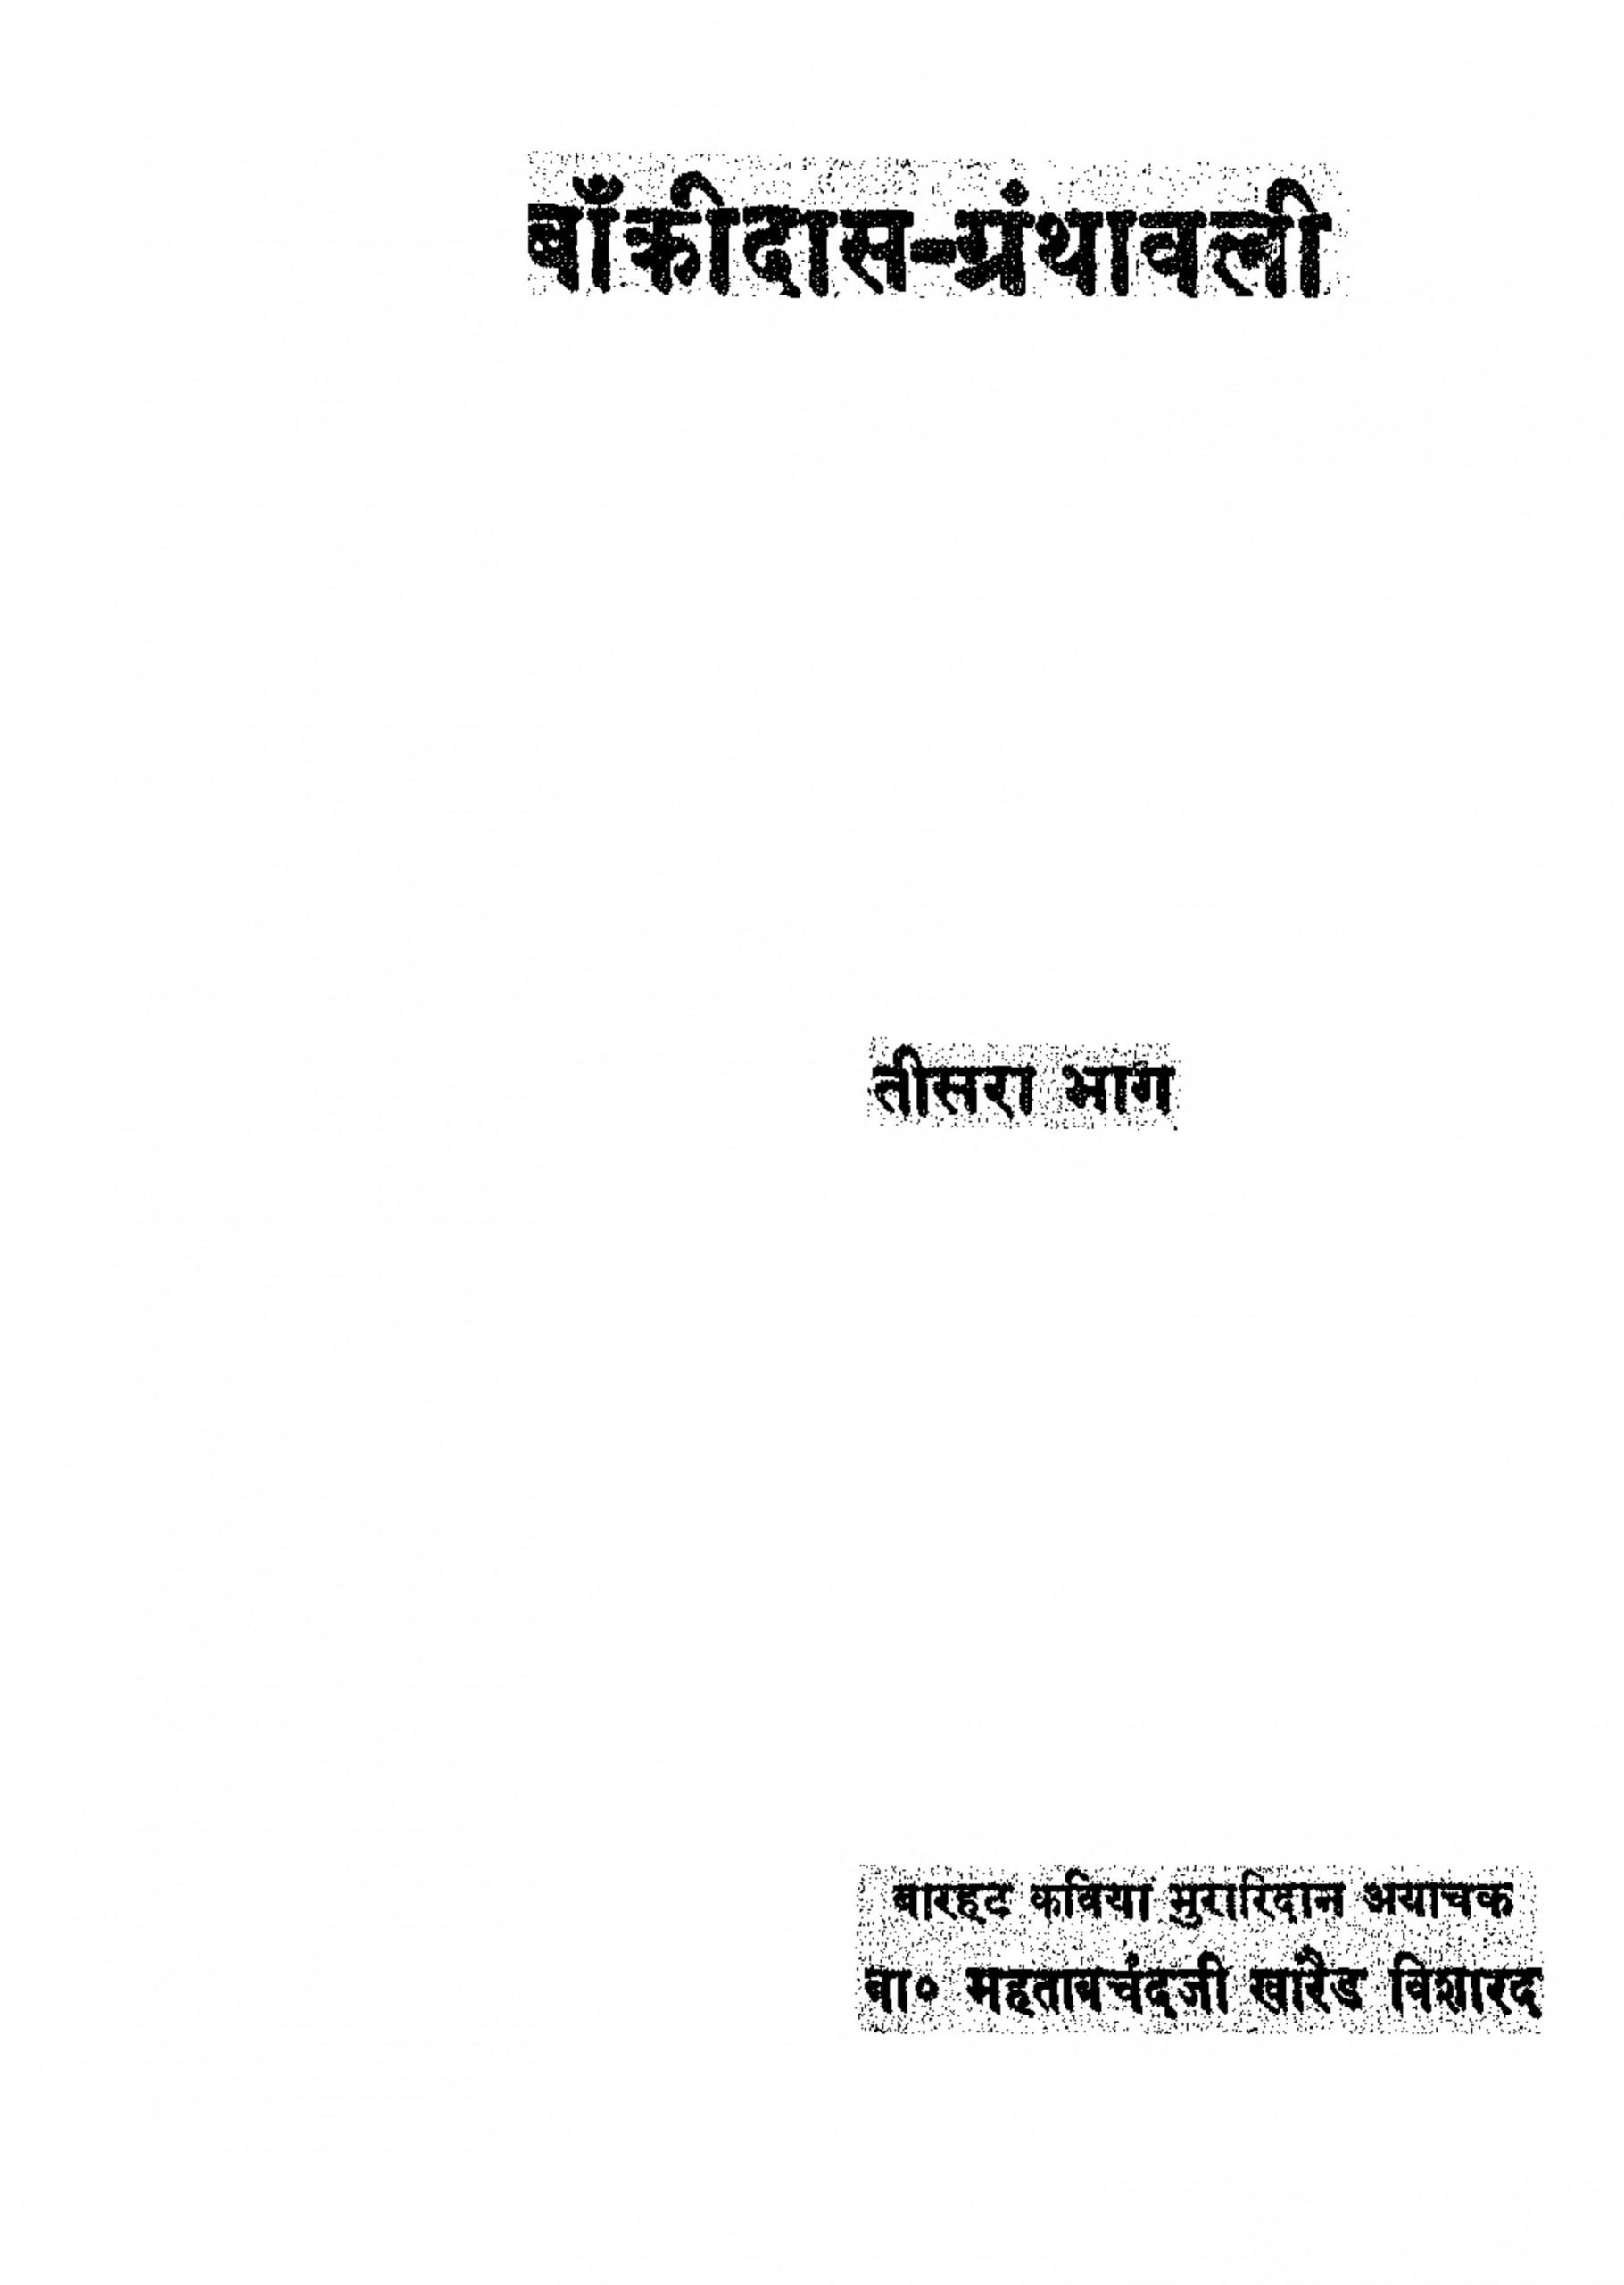 Book Image : बाँकीदास ग्रन्थावली - Bankidas-granthwali